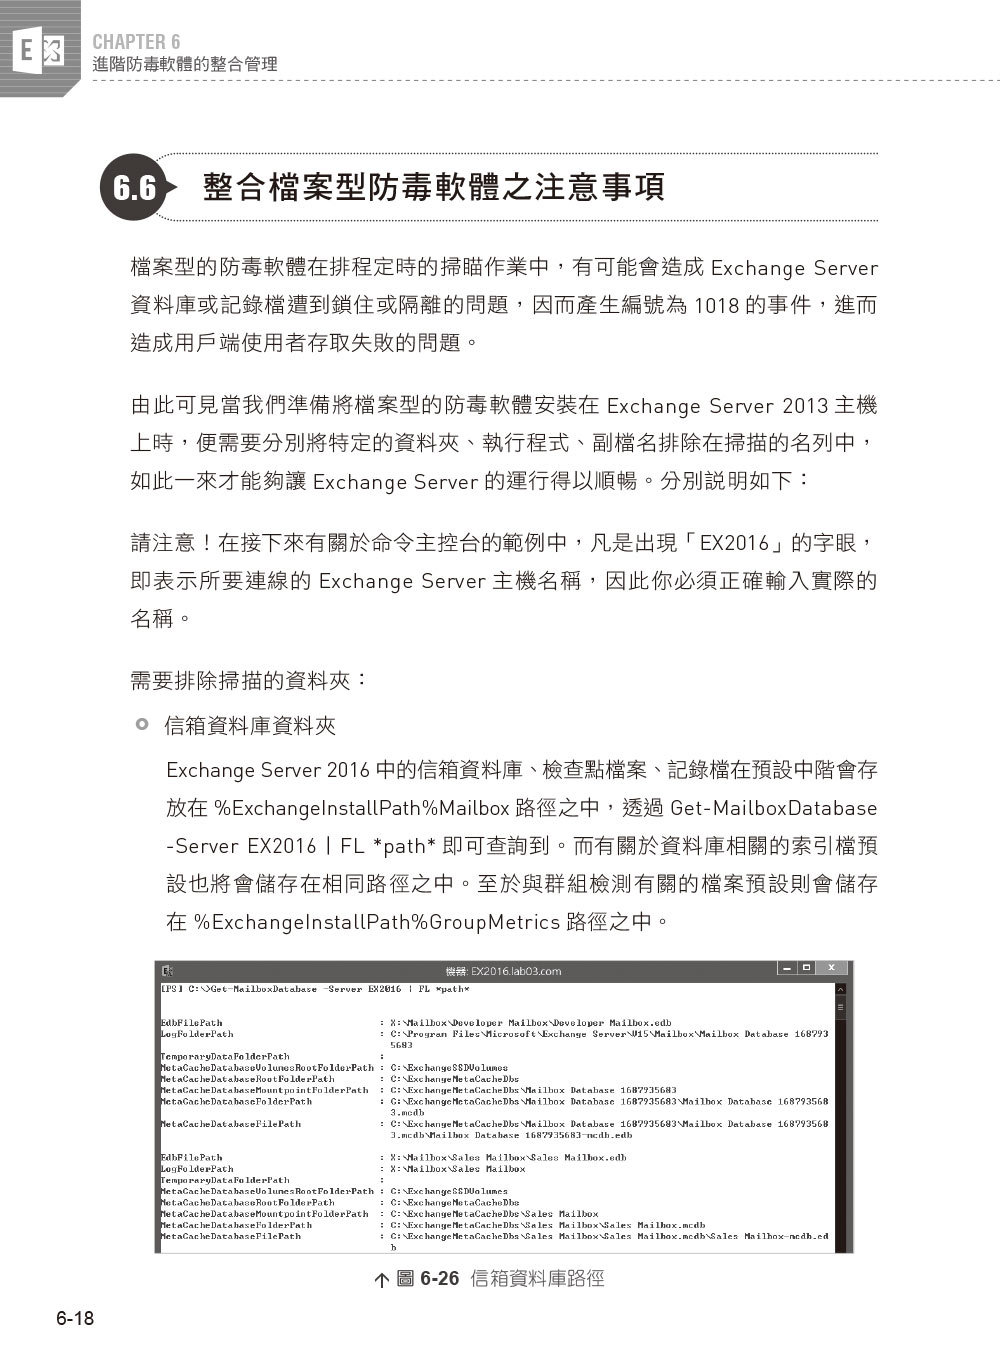 Exchange Server 2016 工作現場實戰寶典|資安防護x高可用性x法遵管理x混合雲架構-preview-1